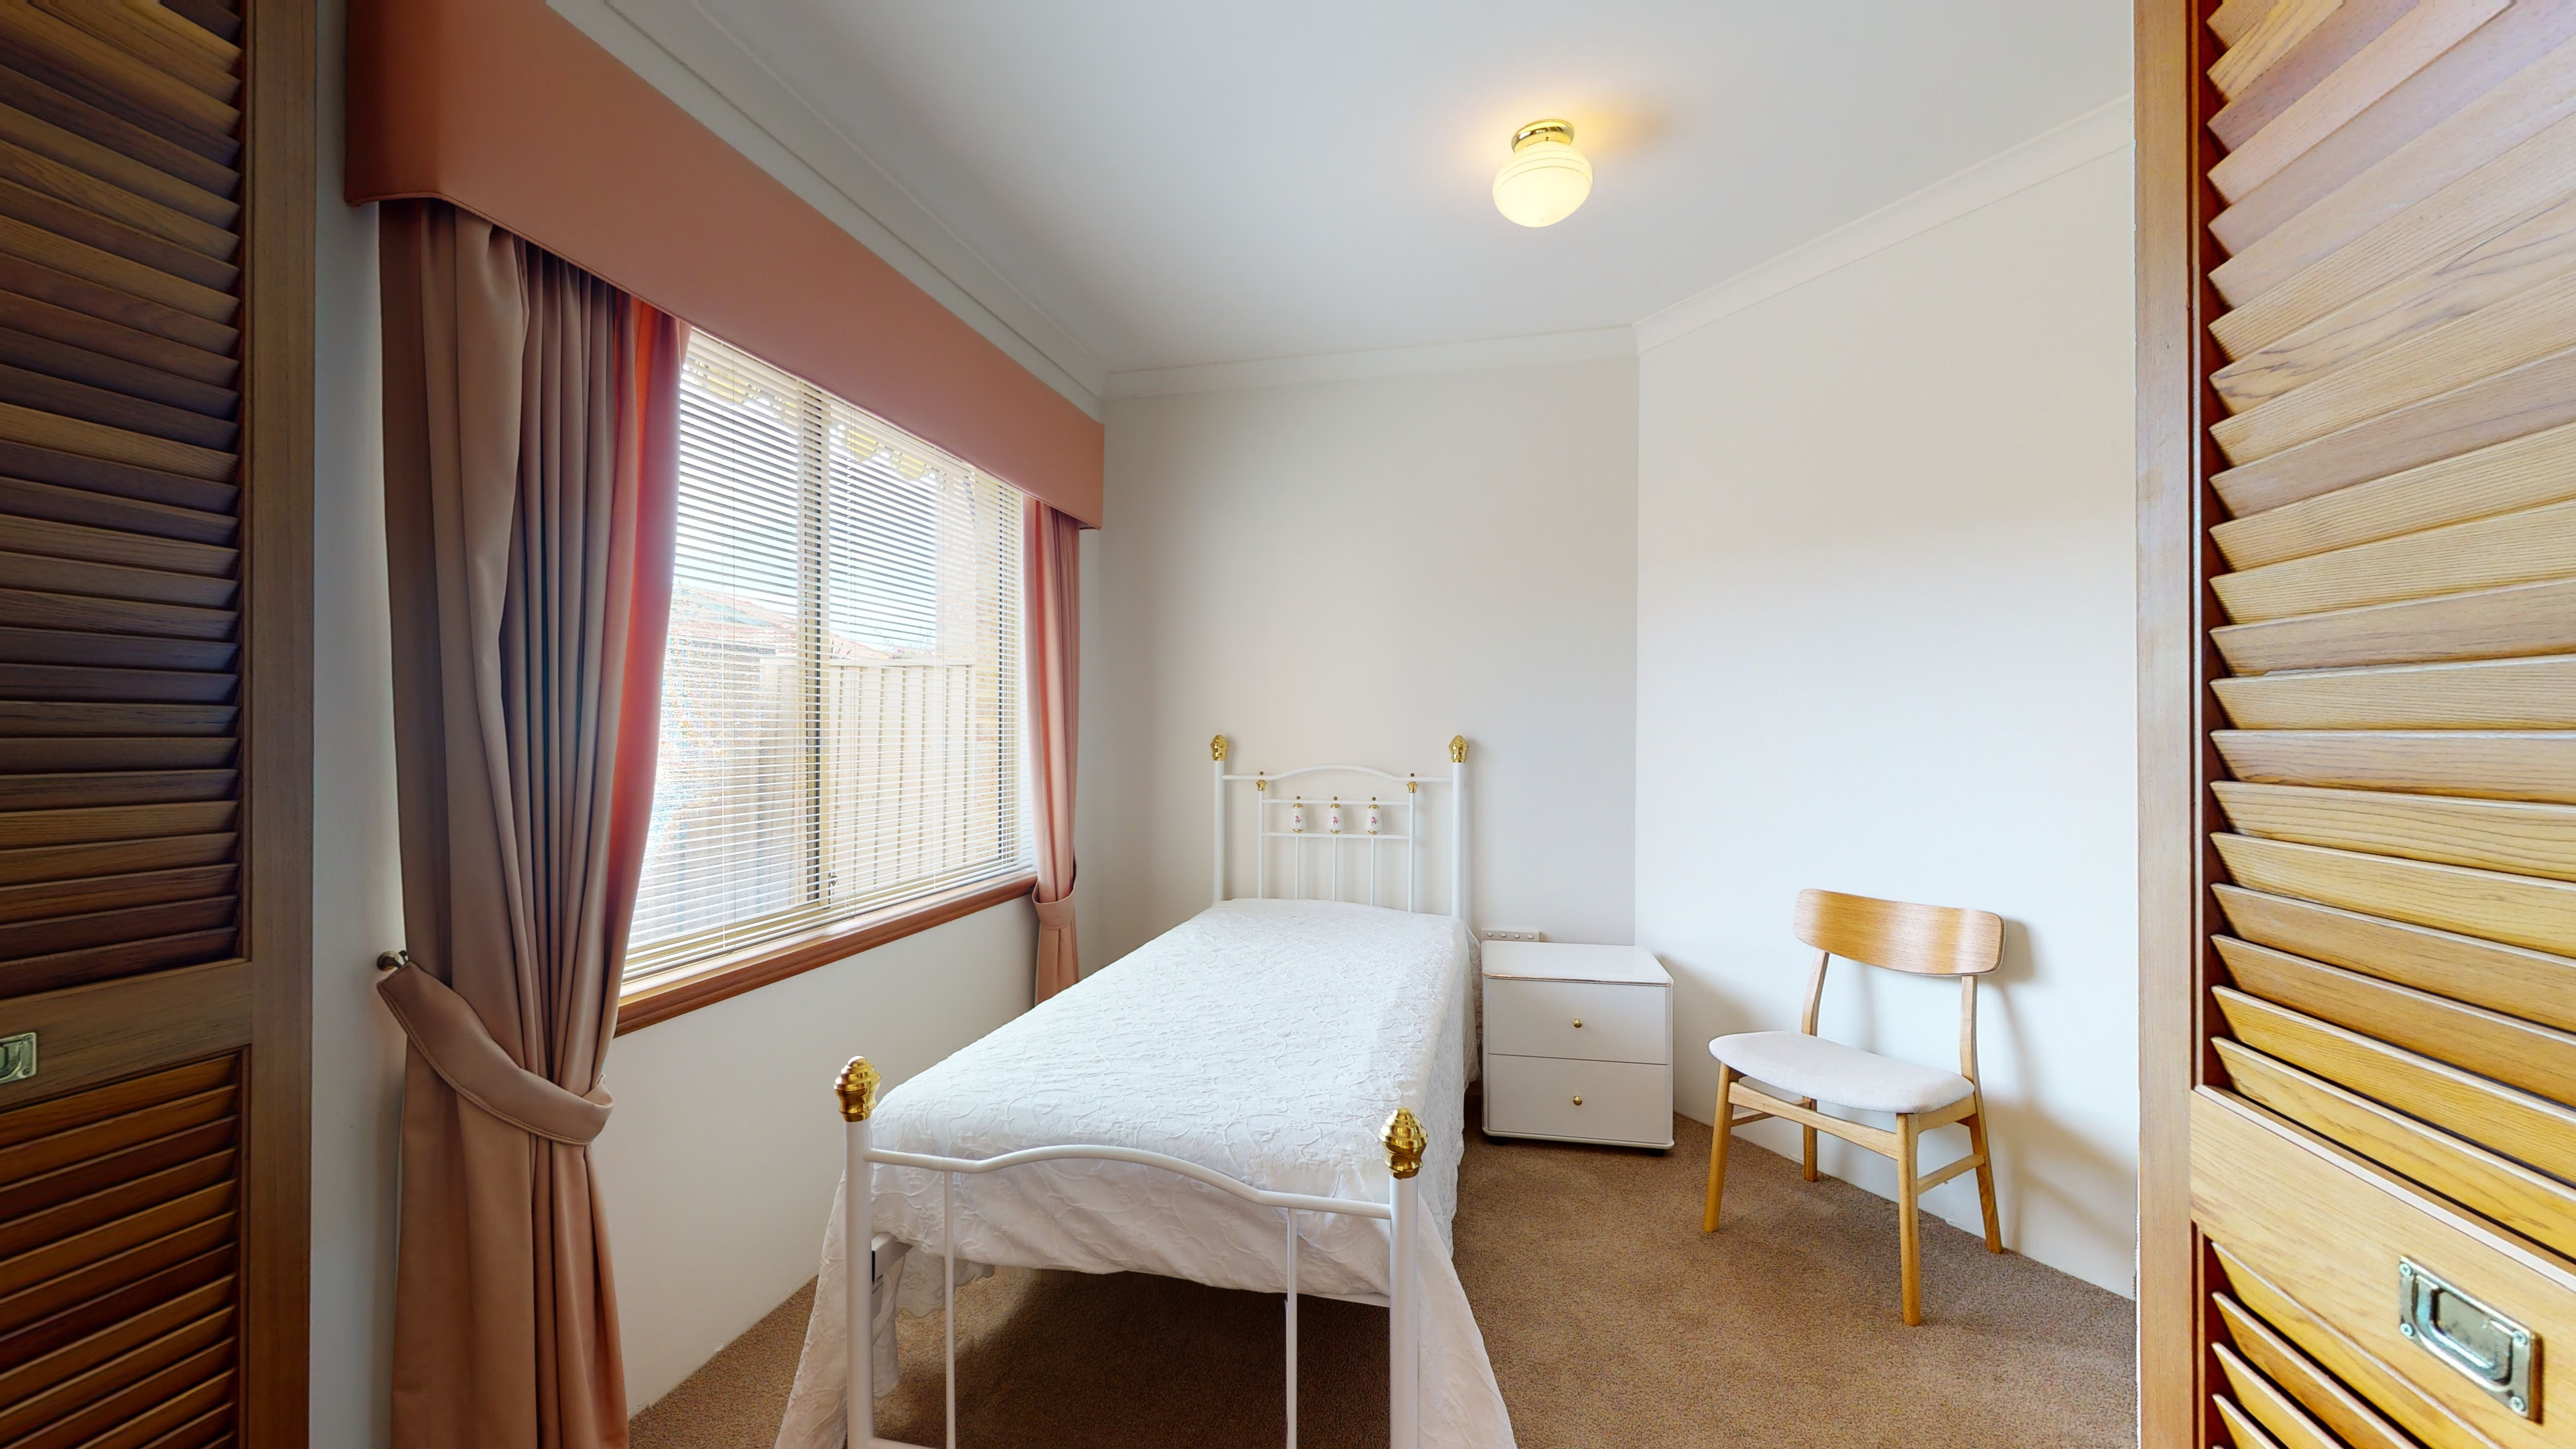 29959140 1622442294 29341 207 177 Dampier Avenue Kallaroo Bedroom Two1